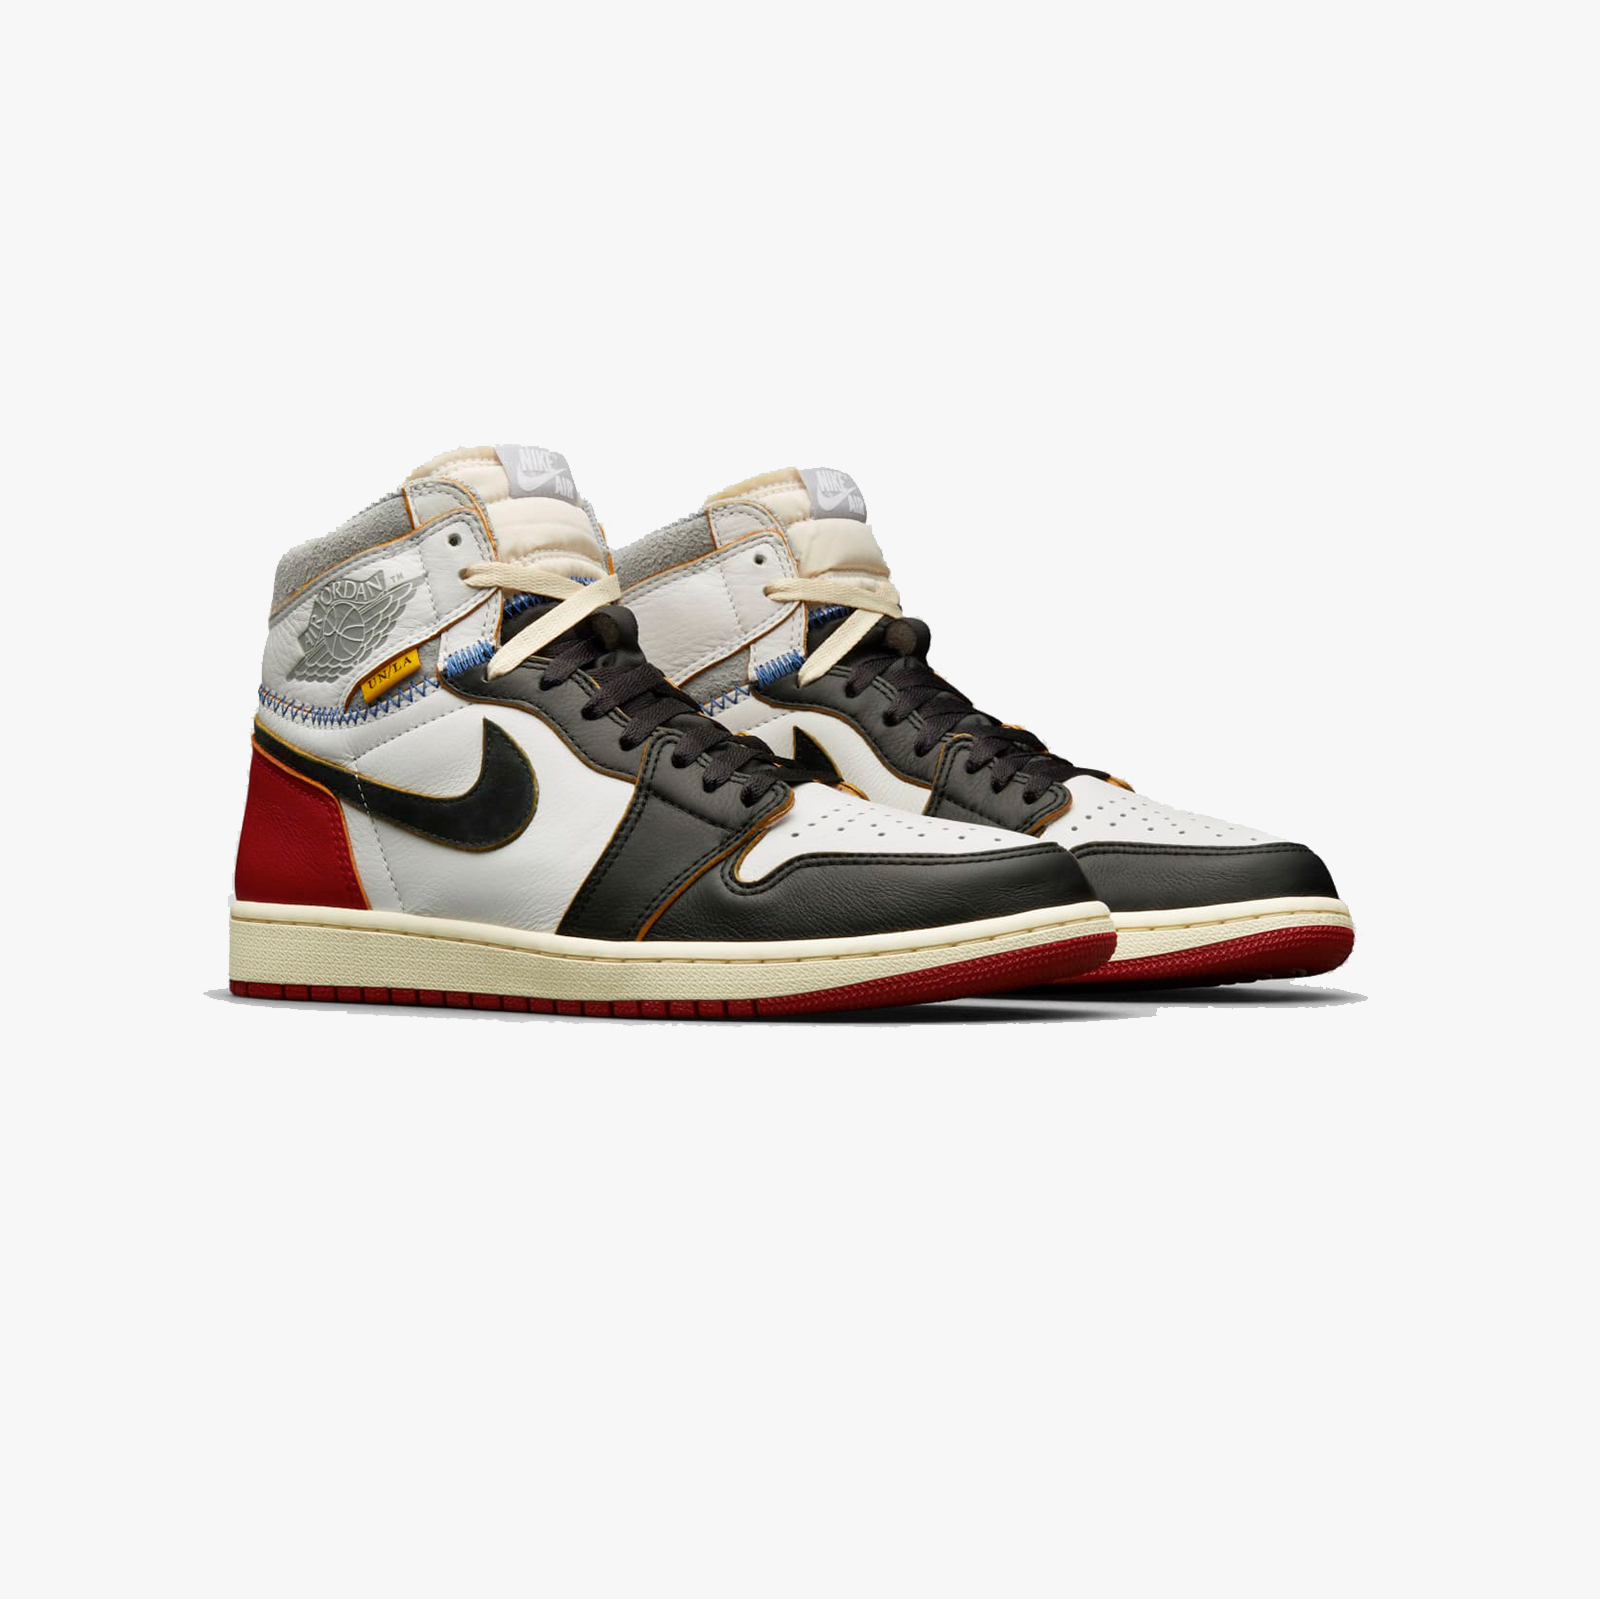 buy popular 7e652 e02d8 Jordan Brand Air Jordan 1 Retro Hi NRG   Union - Bv1300-106 -  Sneakersnstuff   sneakers   streetwear online since 1999